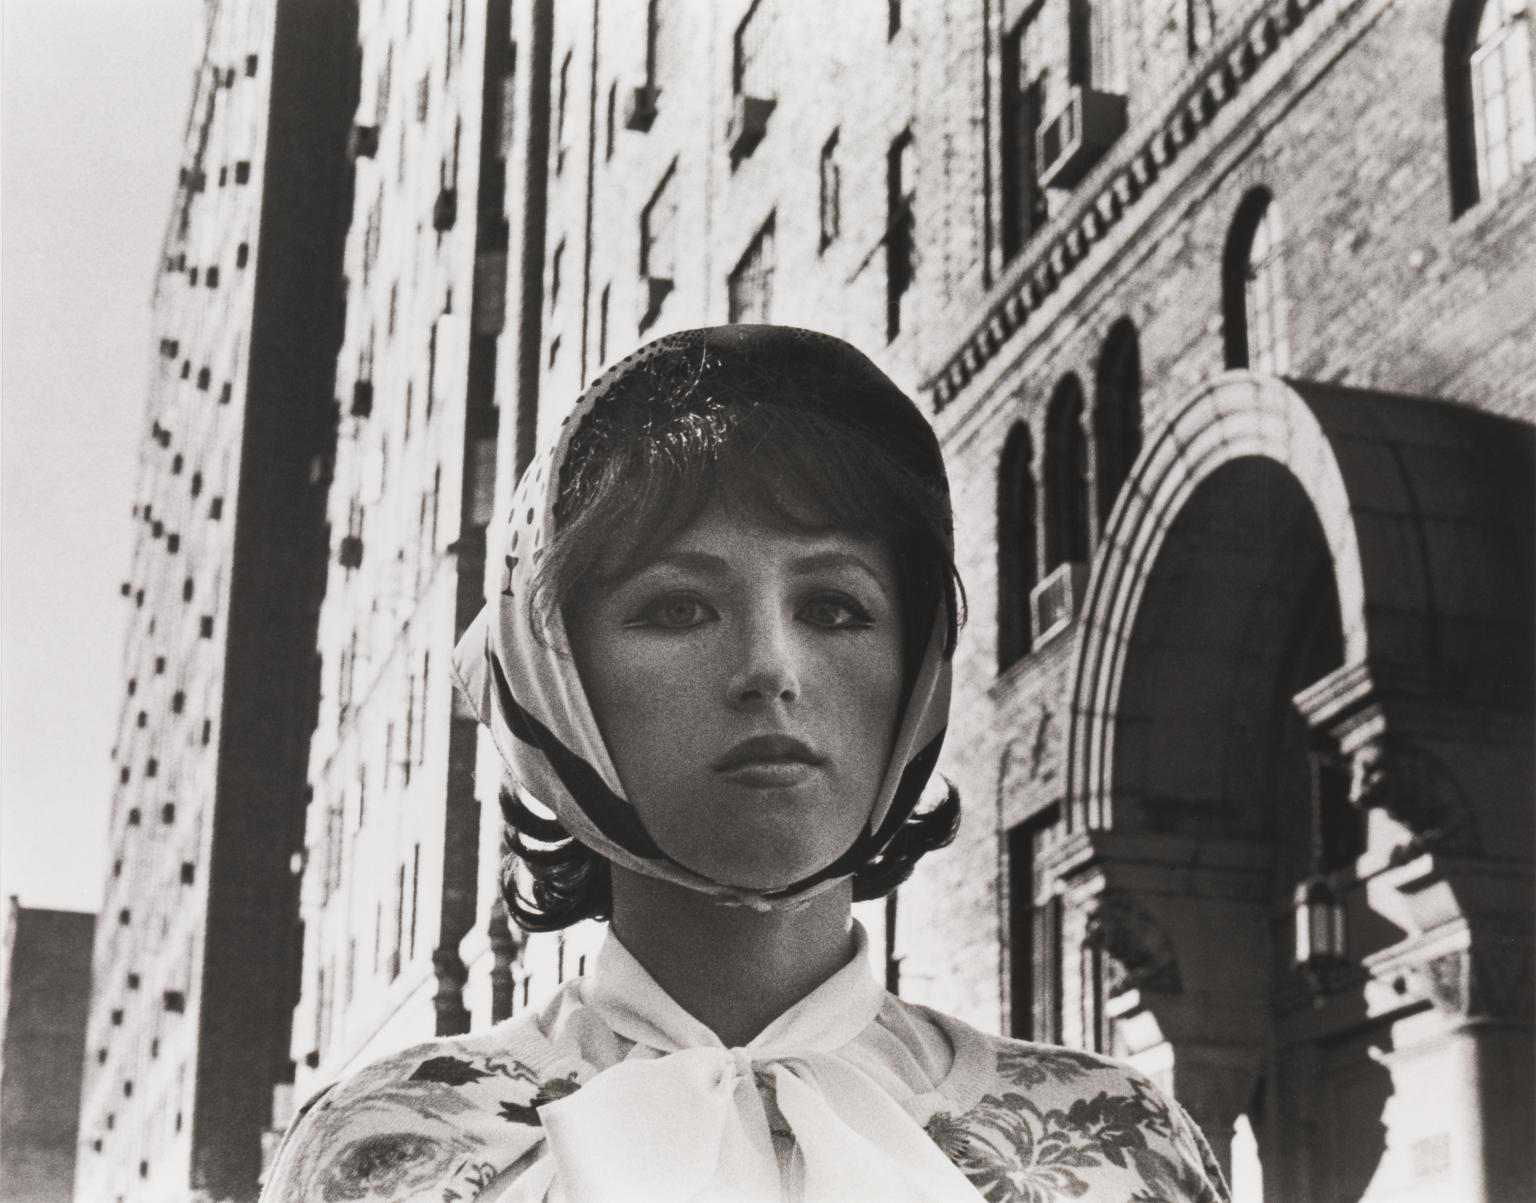 Untitled Film Still #17, 1978 by Cindy Sherman